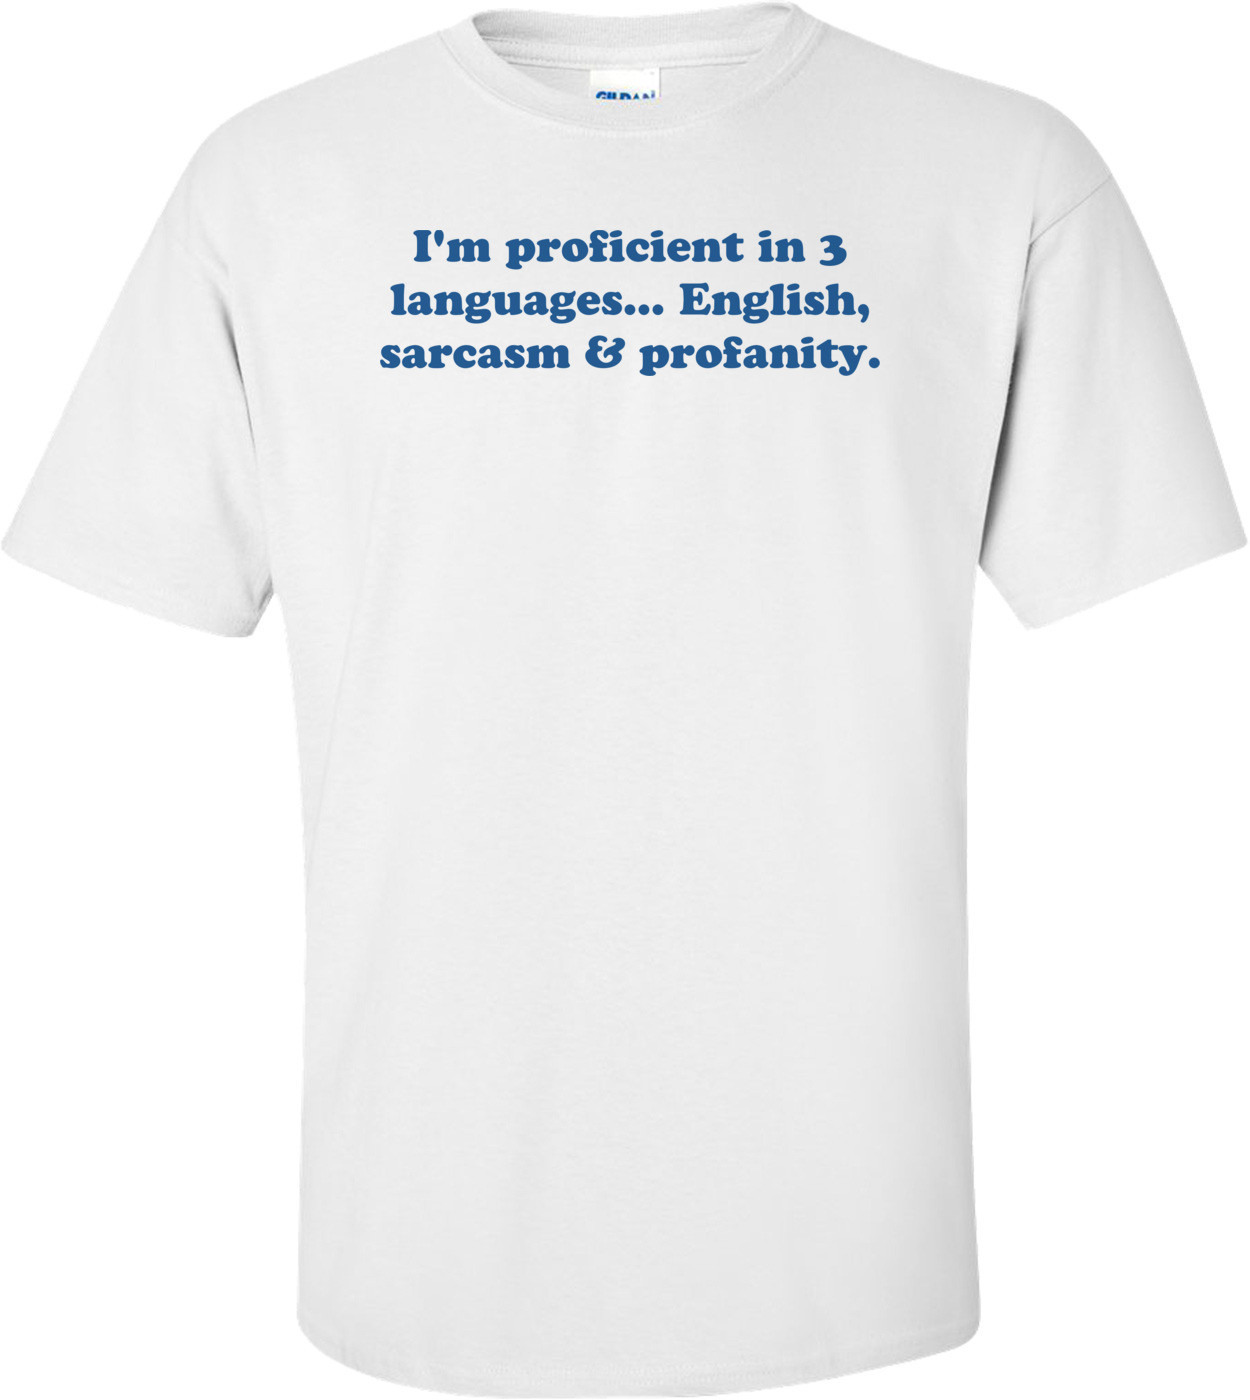 I'm proficient in 3 languages... English, sarcasm & profanity. Shirt